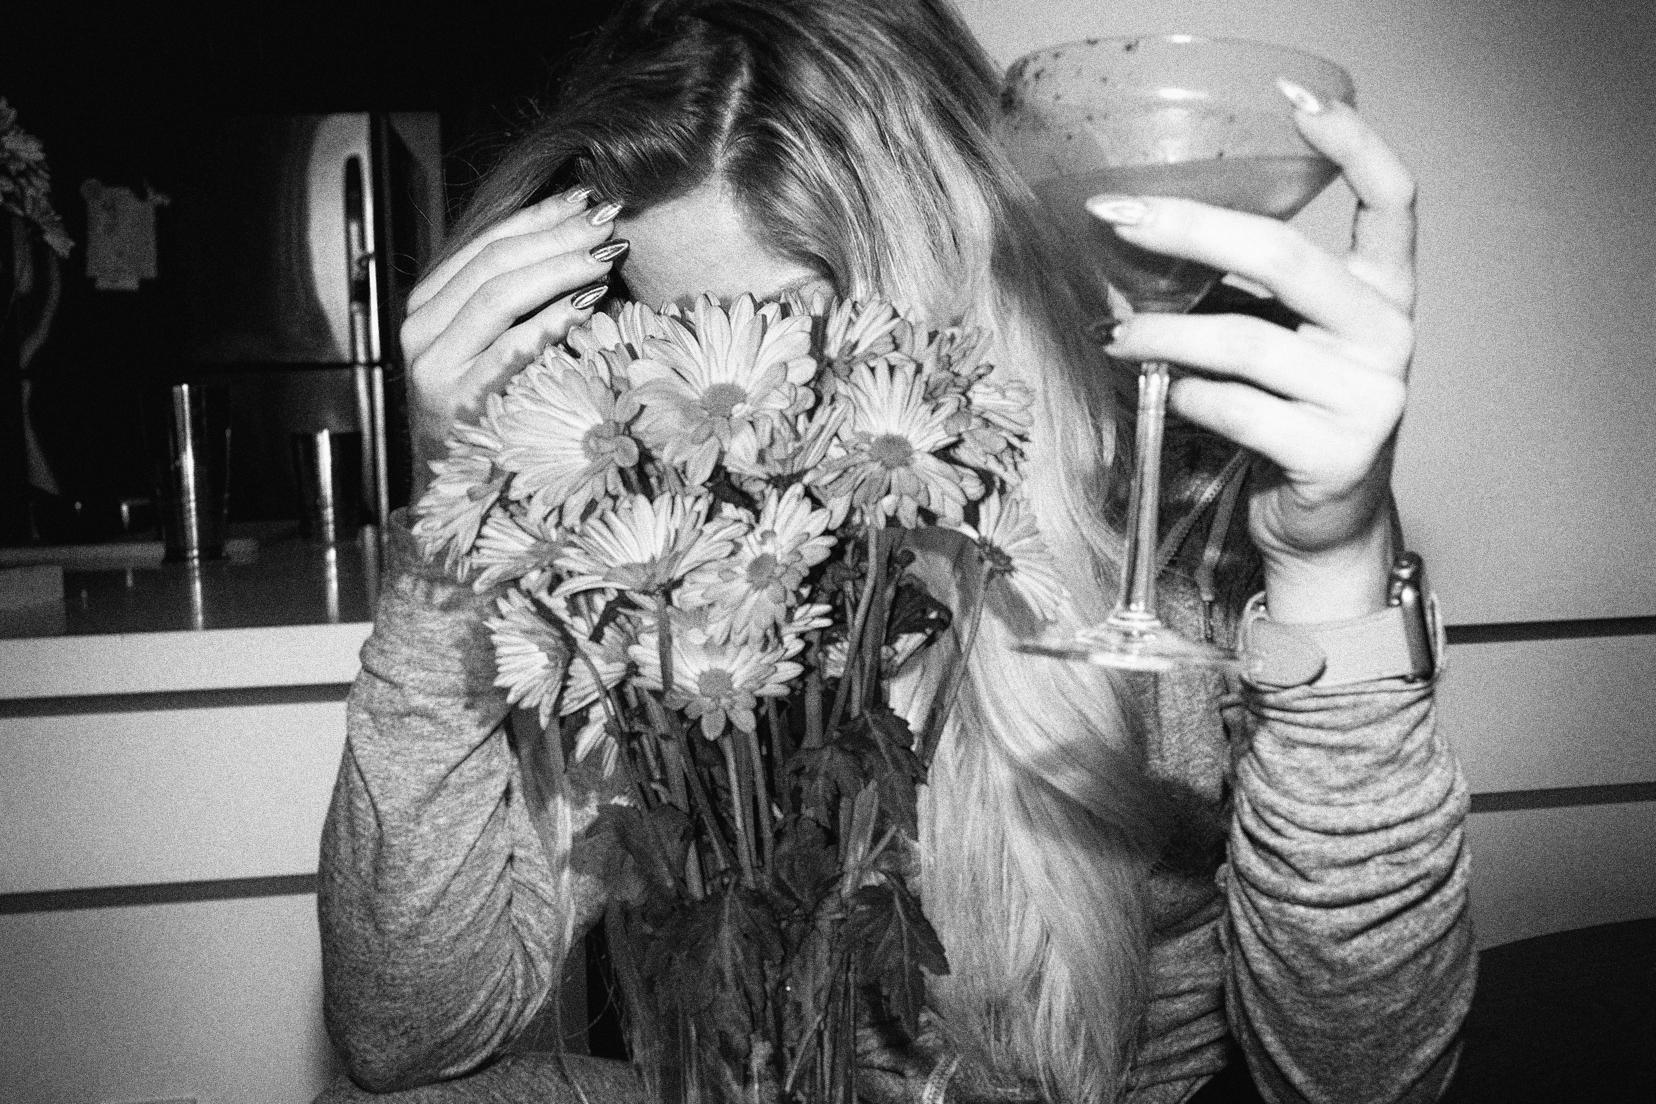 l_flowers_table_web.jpg